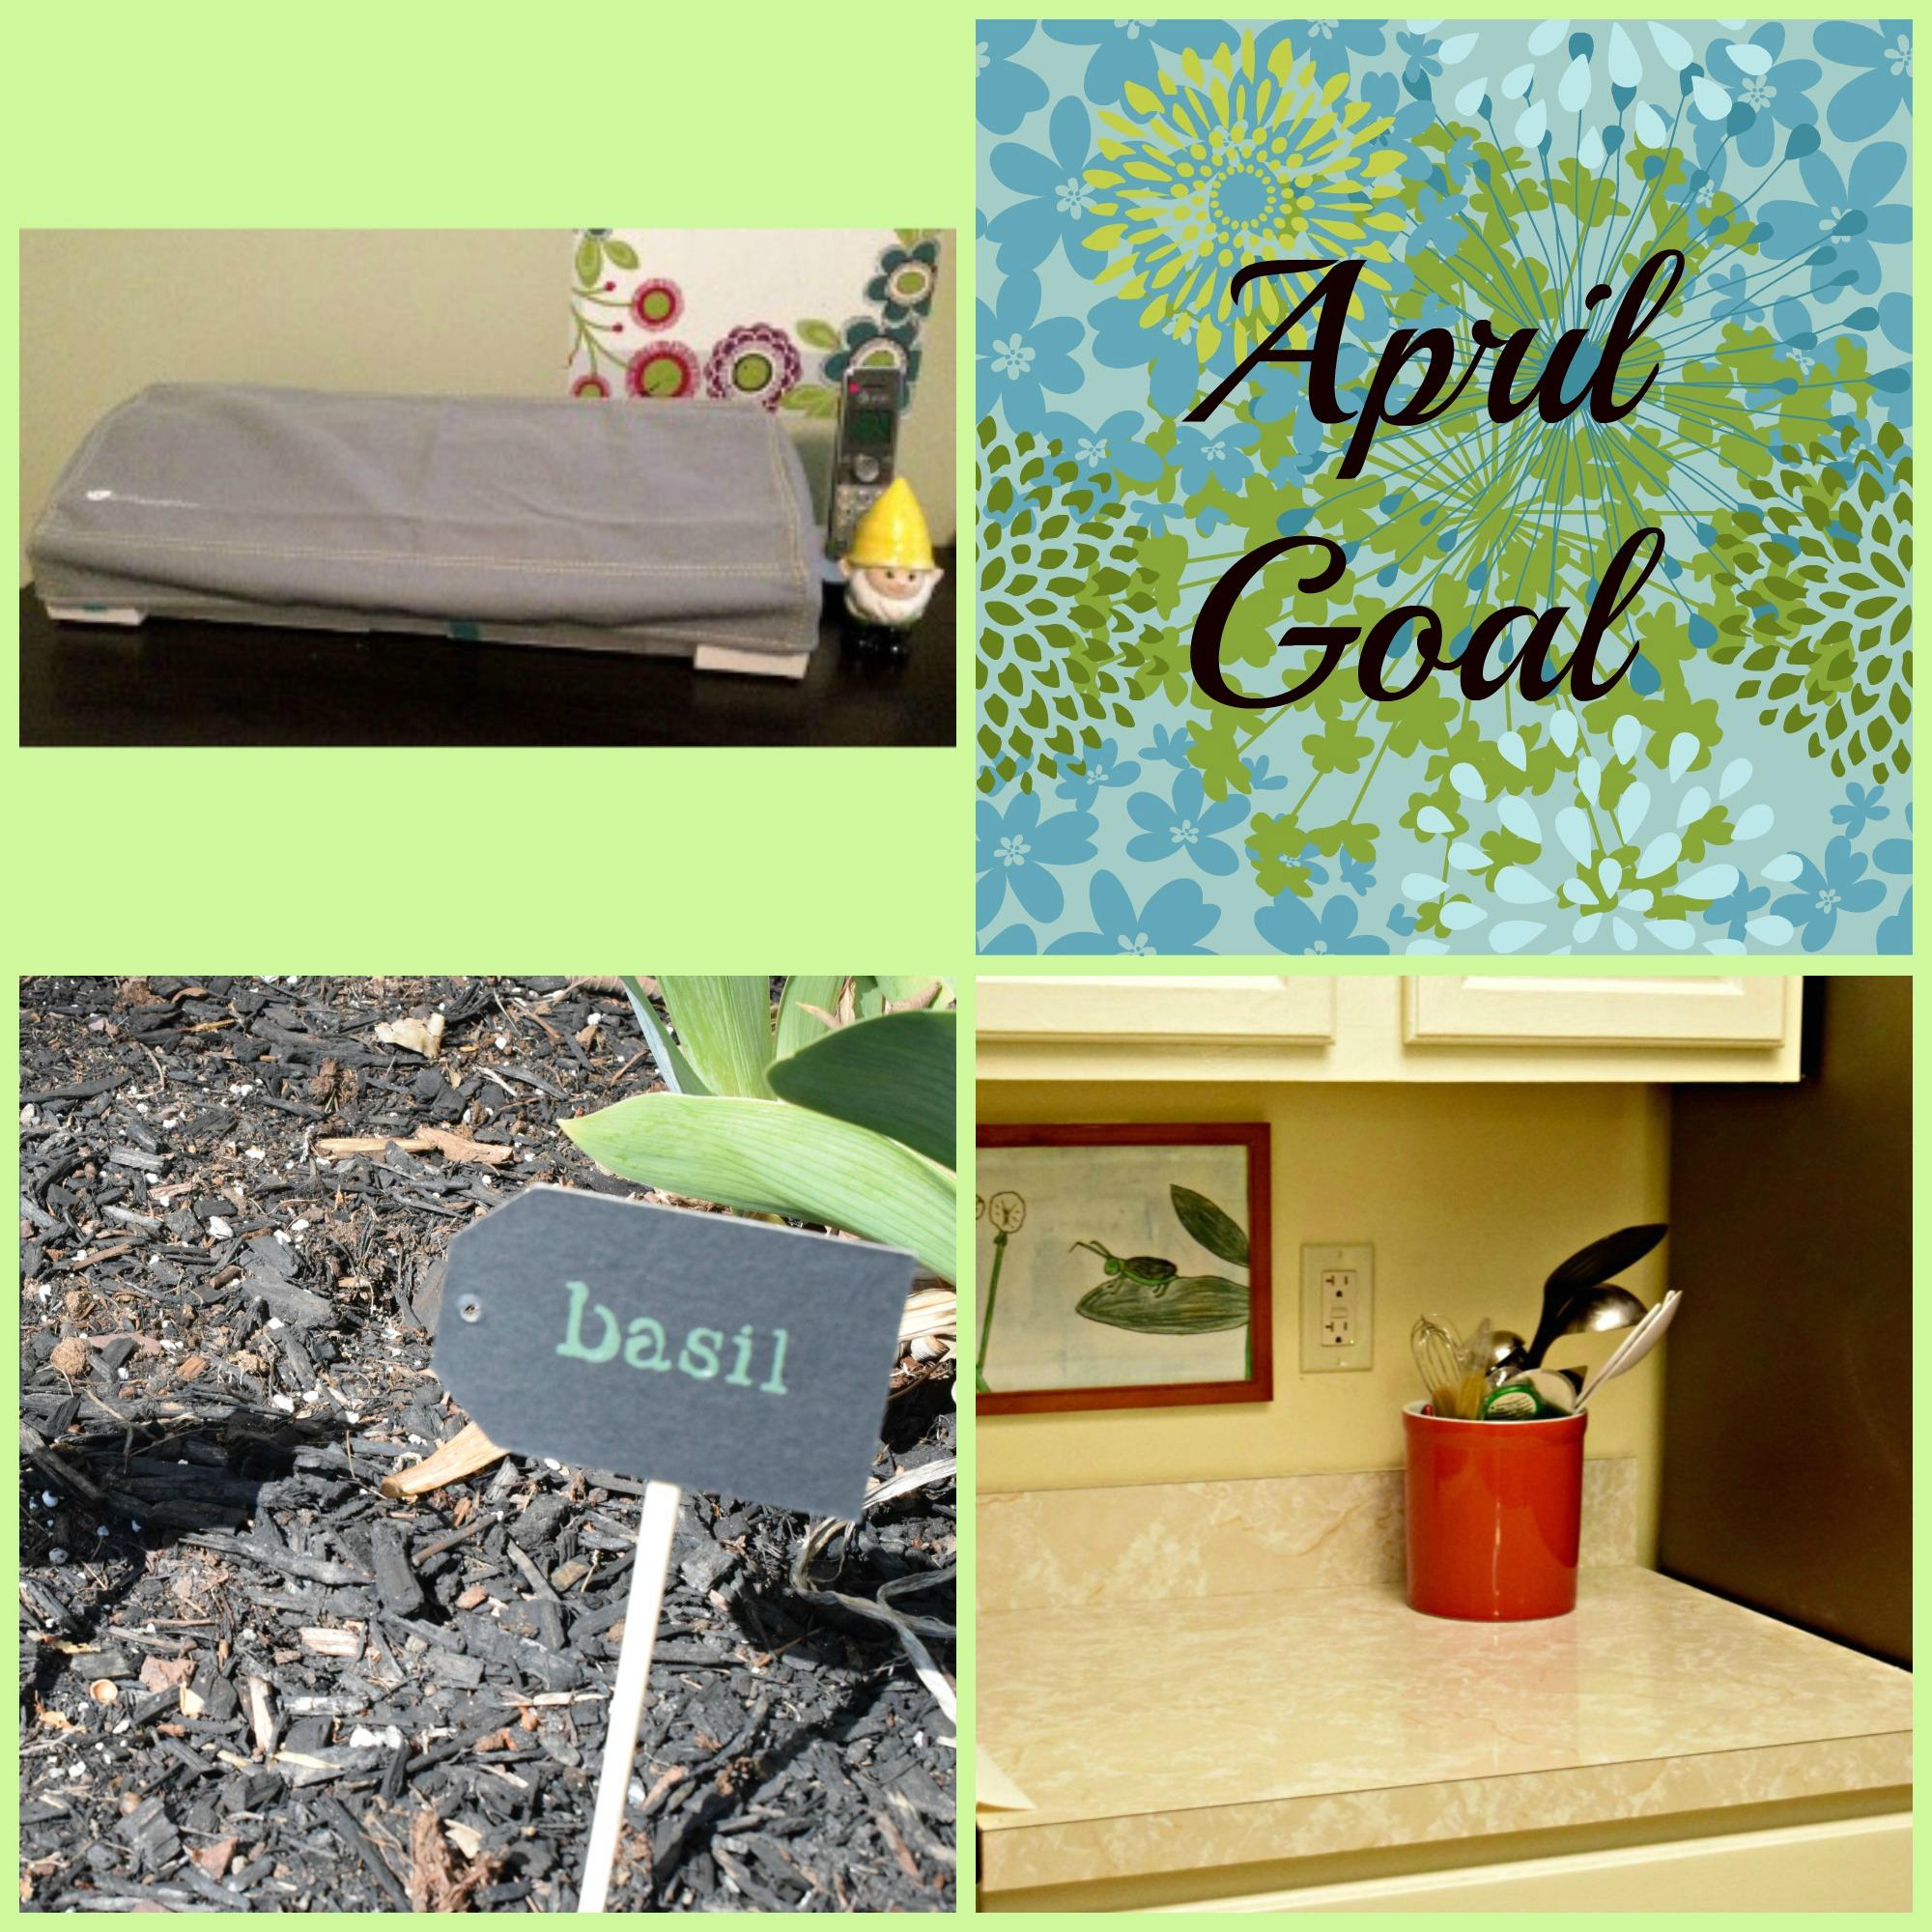 new-april-2017-goal